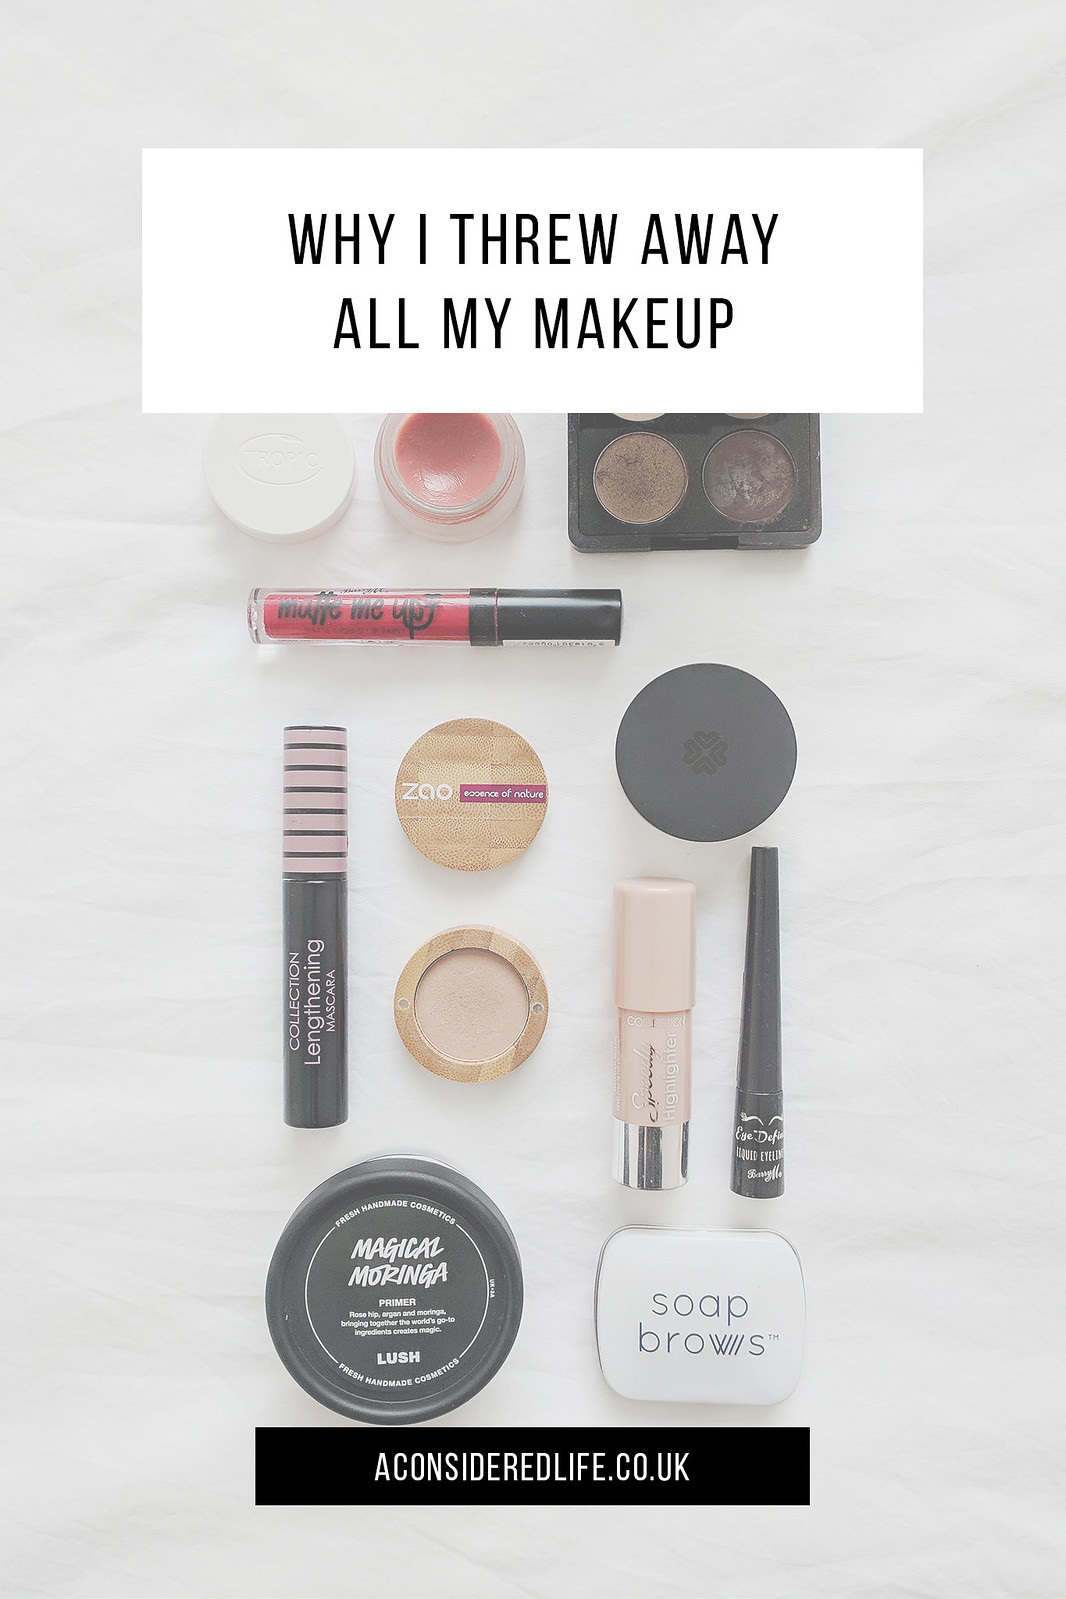 Minimalism and Beauty: Why I Threw Away My Make-Up